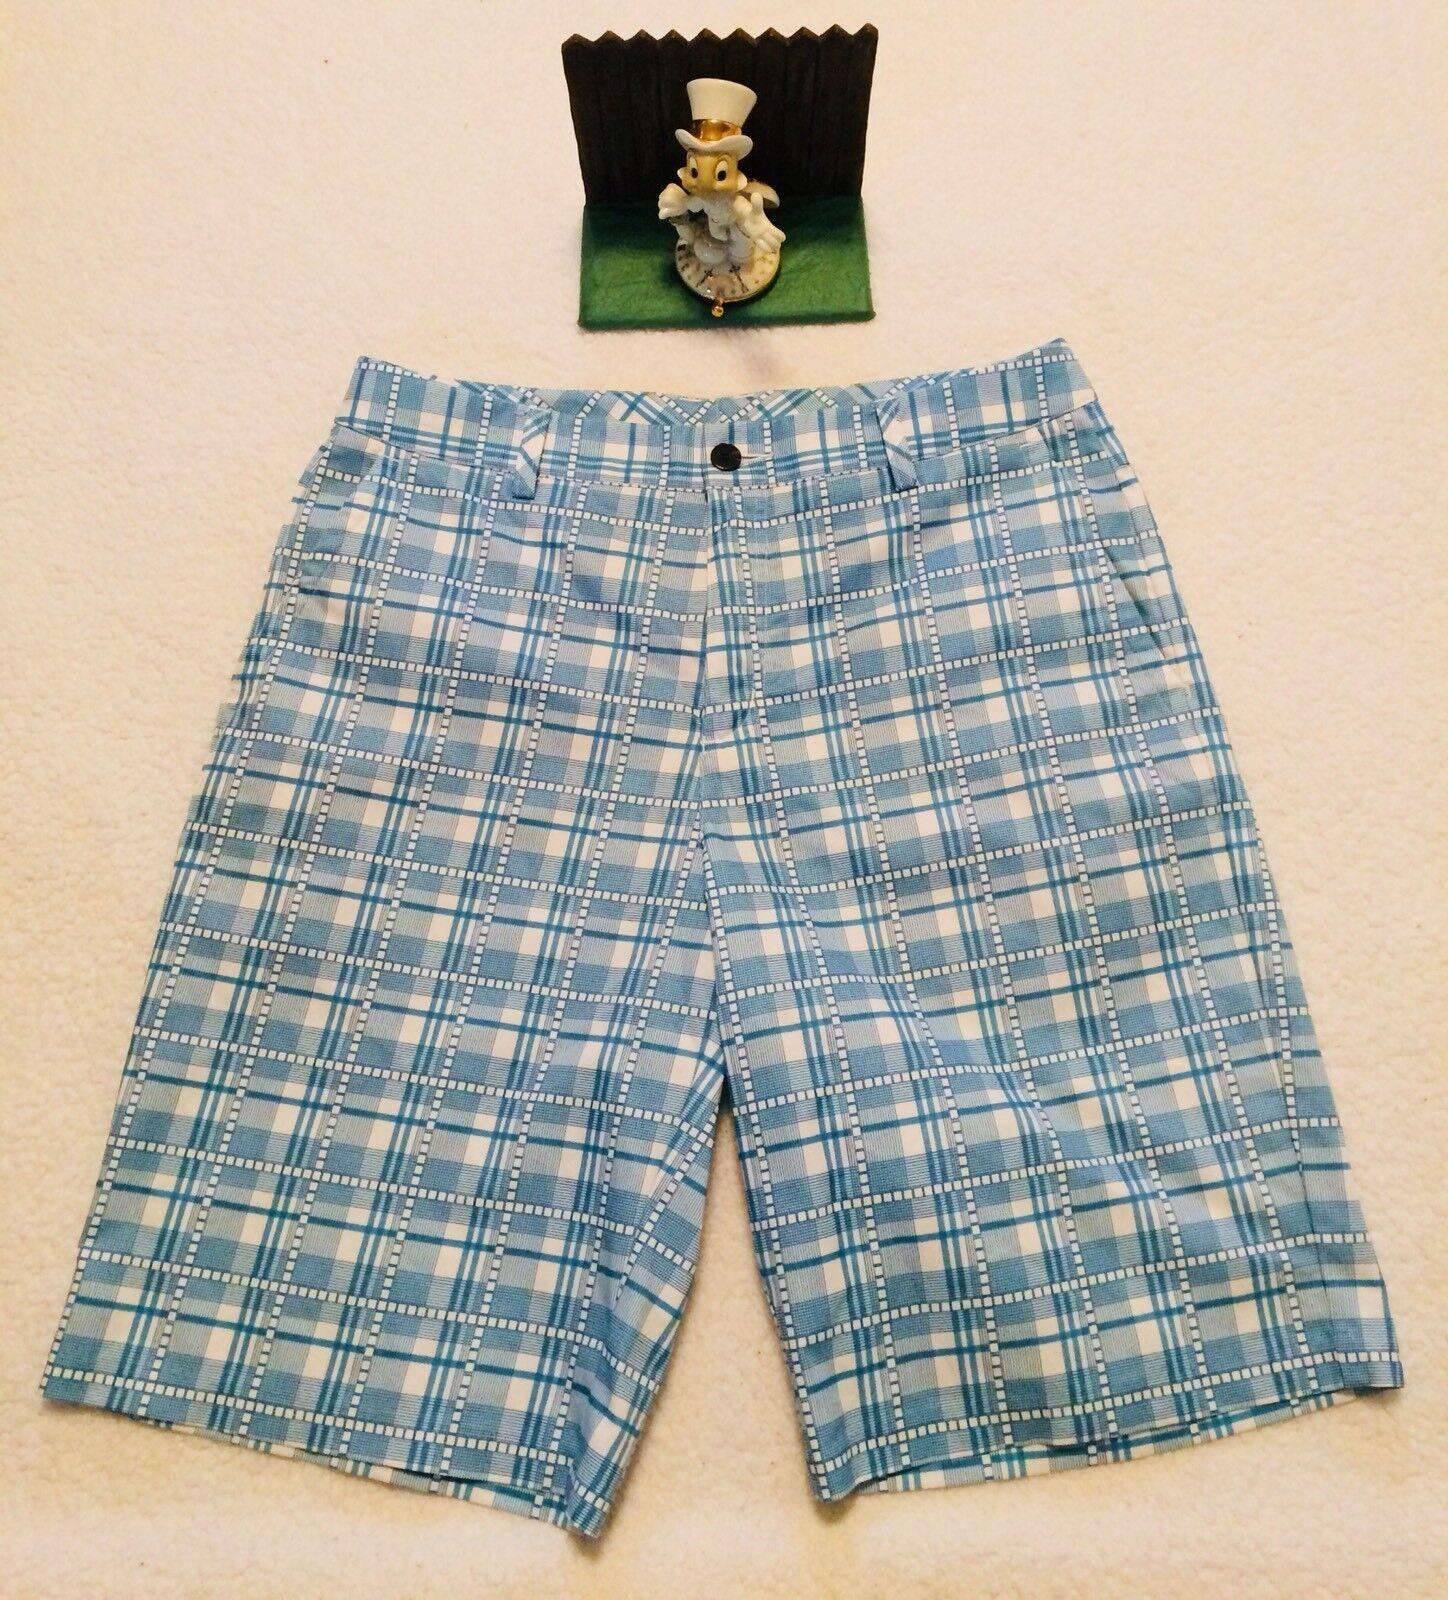 Férfi Adidas Athletic Golf Shorts méret 32 Plaid Polyester ClimaLite  rövidnadrág NEW 106372 54818babc5